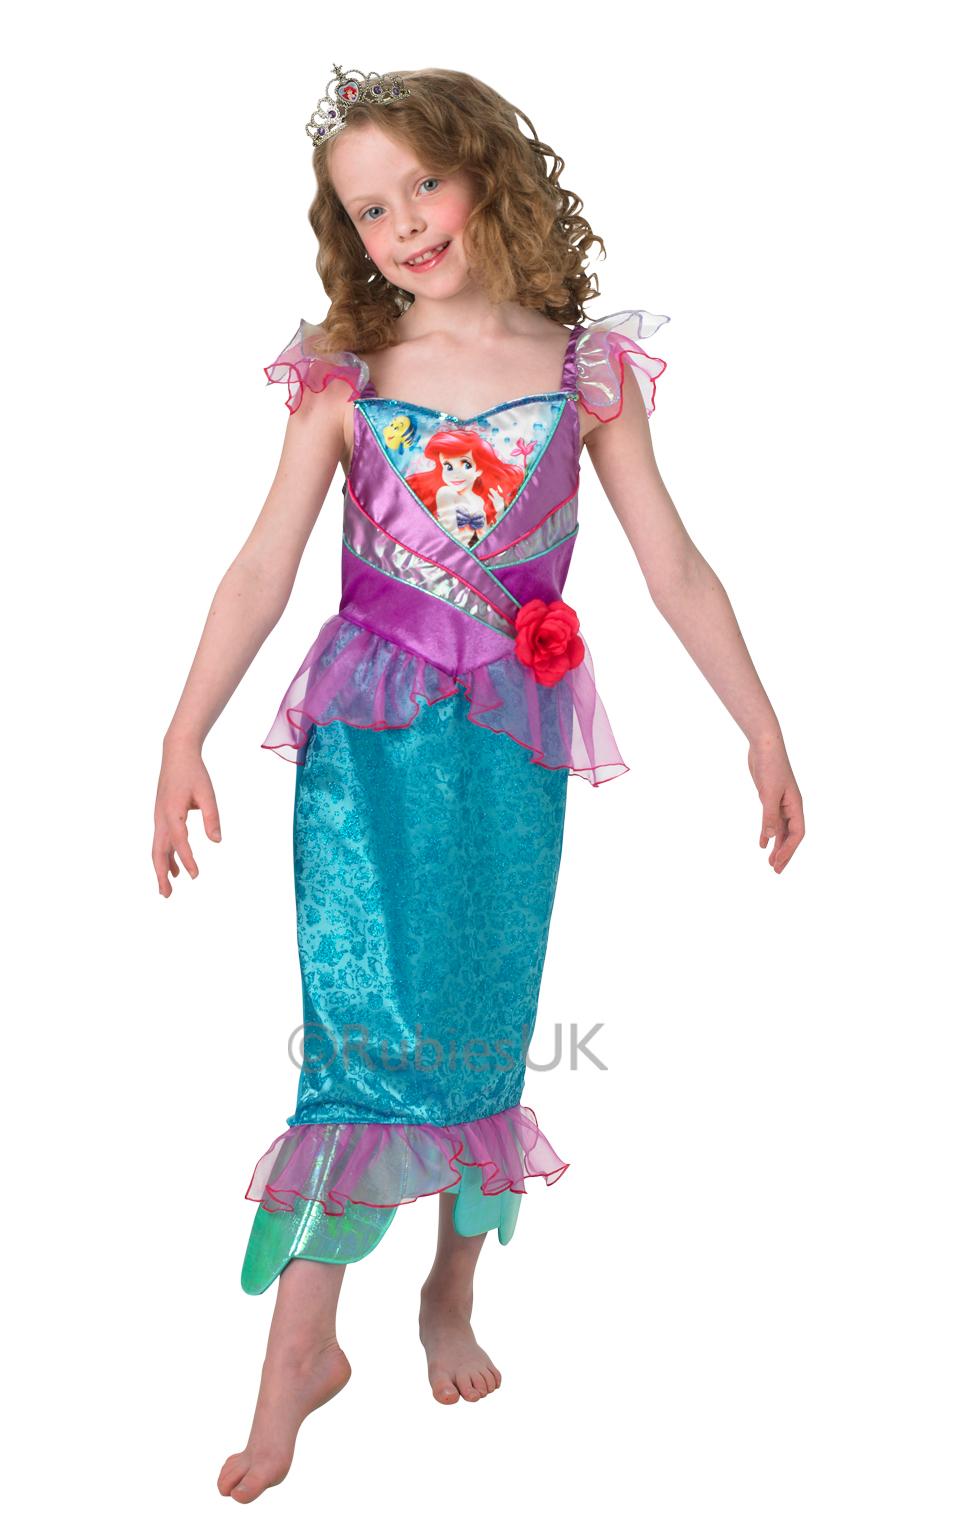 Child Disney Princess Shimmer Ariel Girls Book Week Fancy Dress Kids Costume  sc 1 st  Wonderland Party & Child Disney Princess Shimmer Ariel Girls Book Week Fancy Dress Kids ...